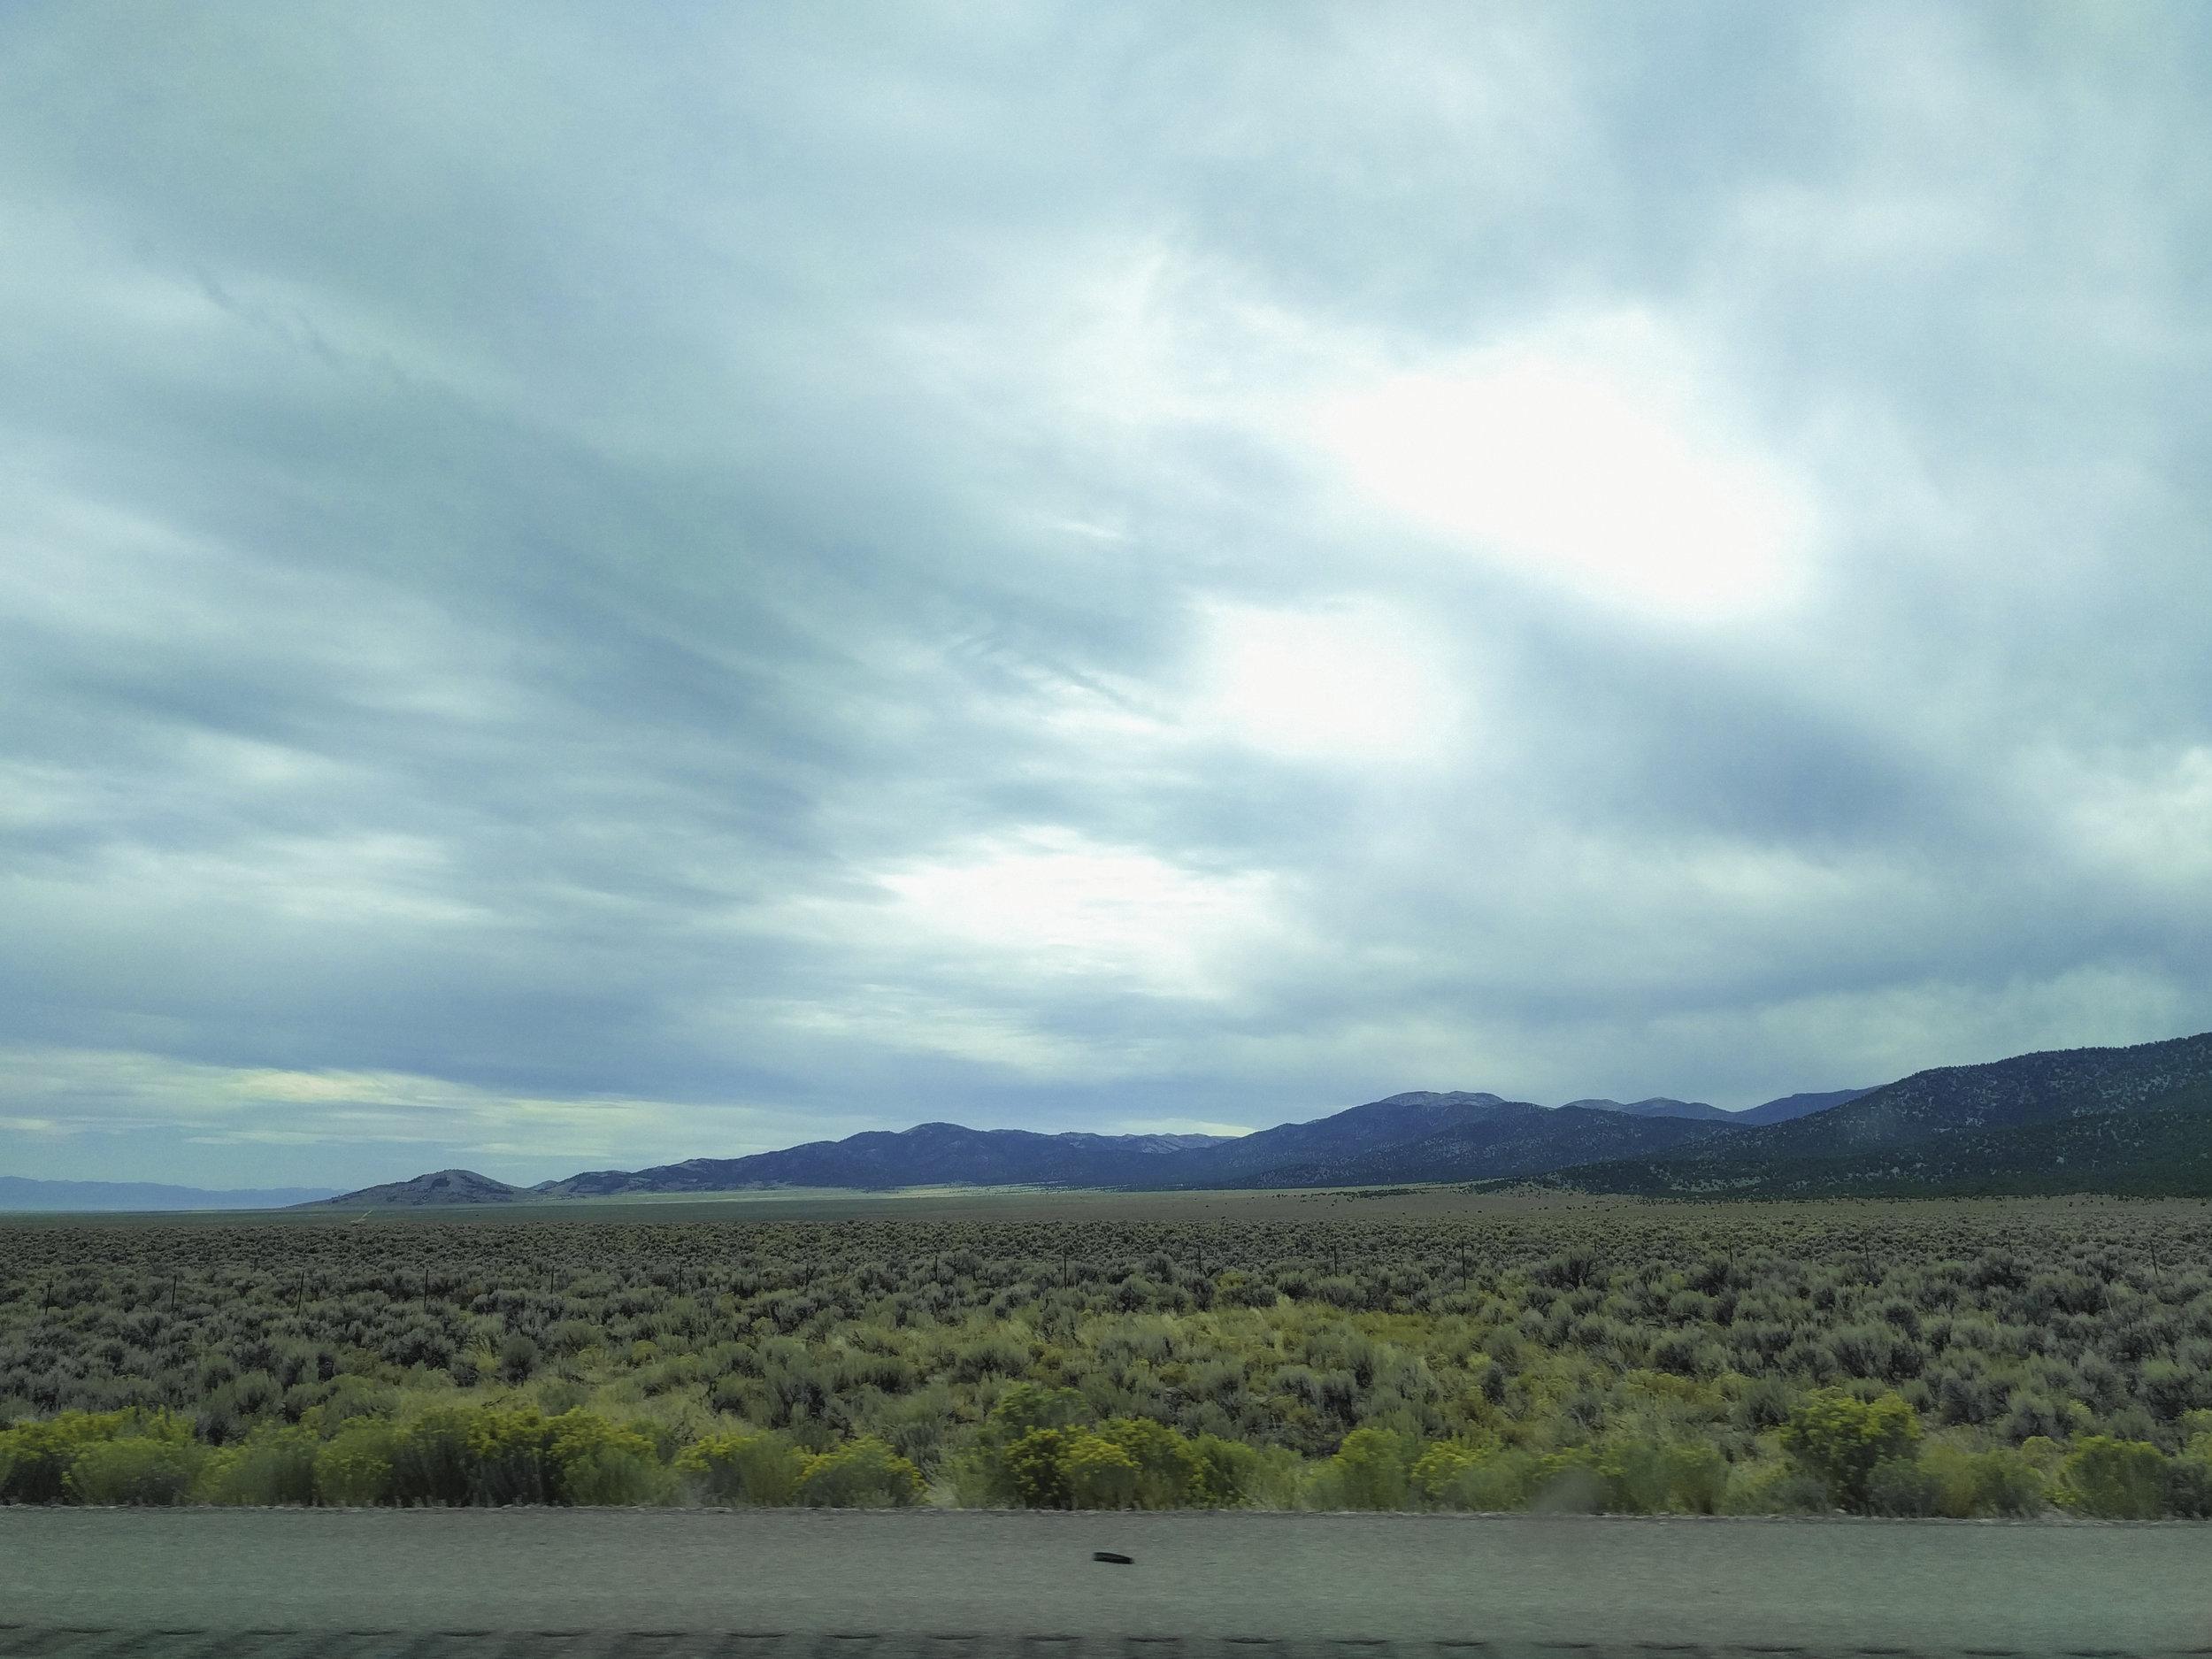 More vast nothingness